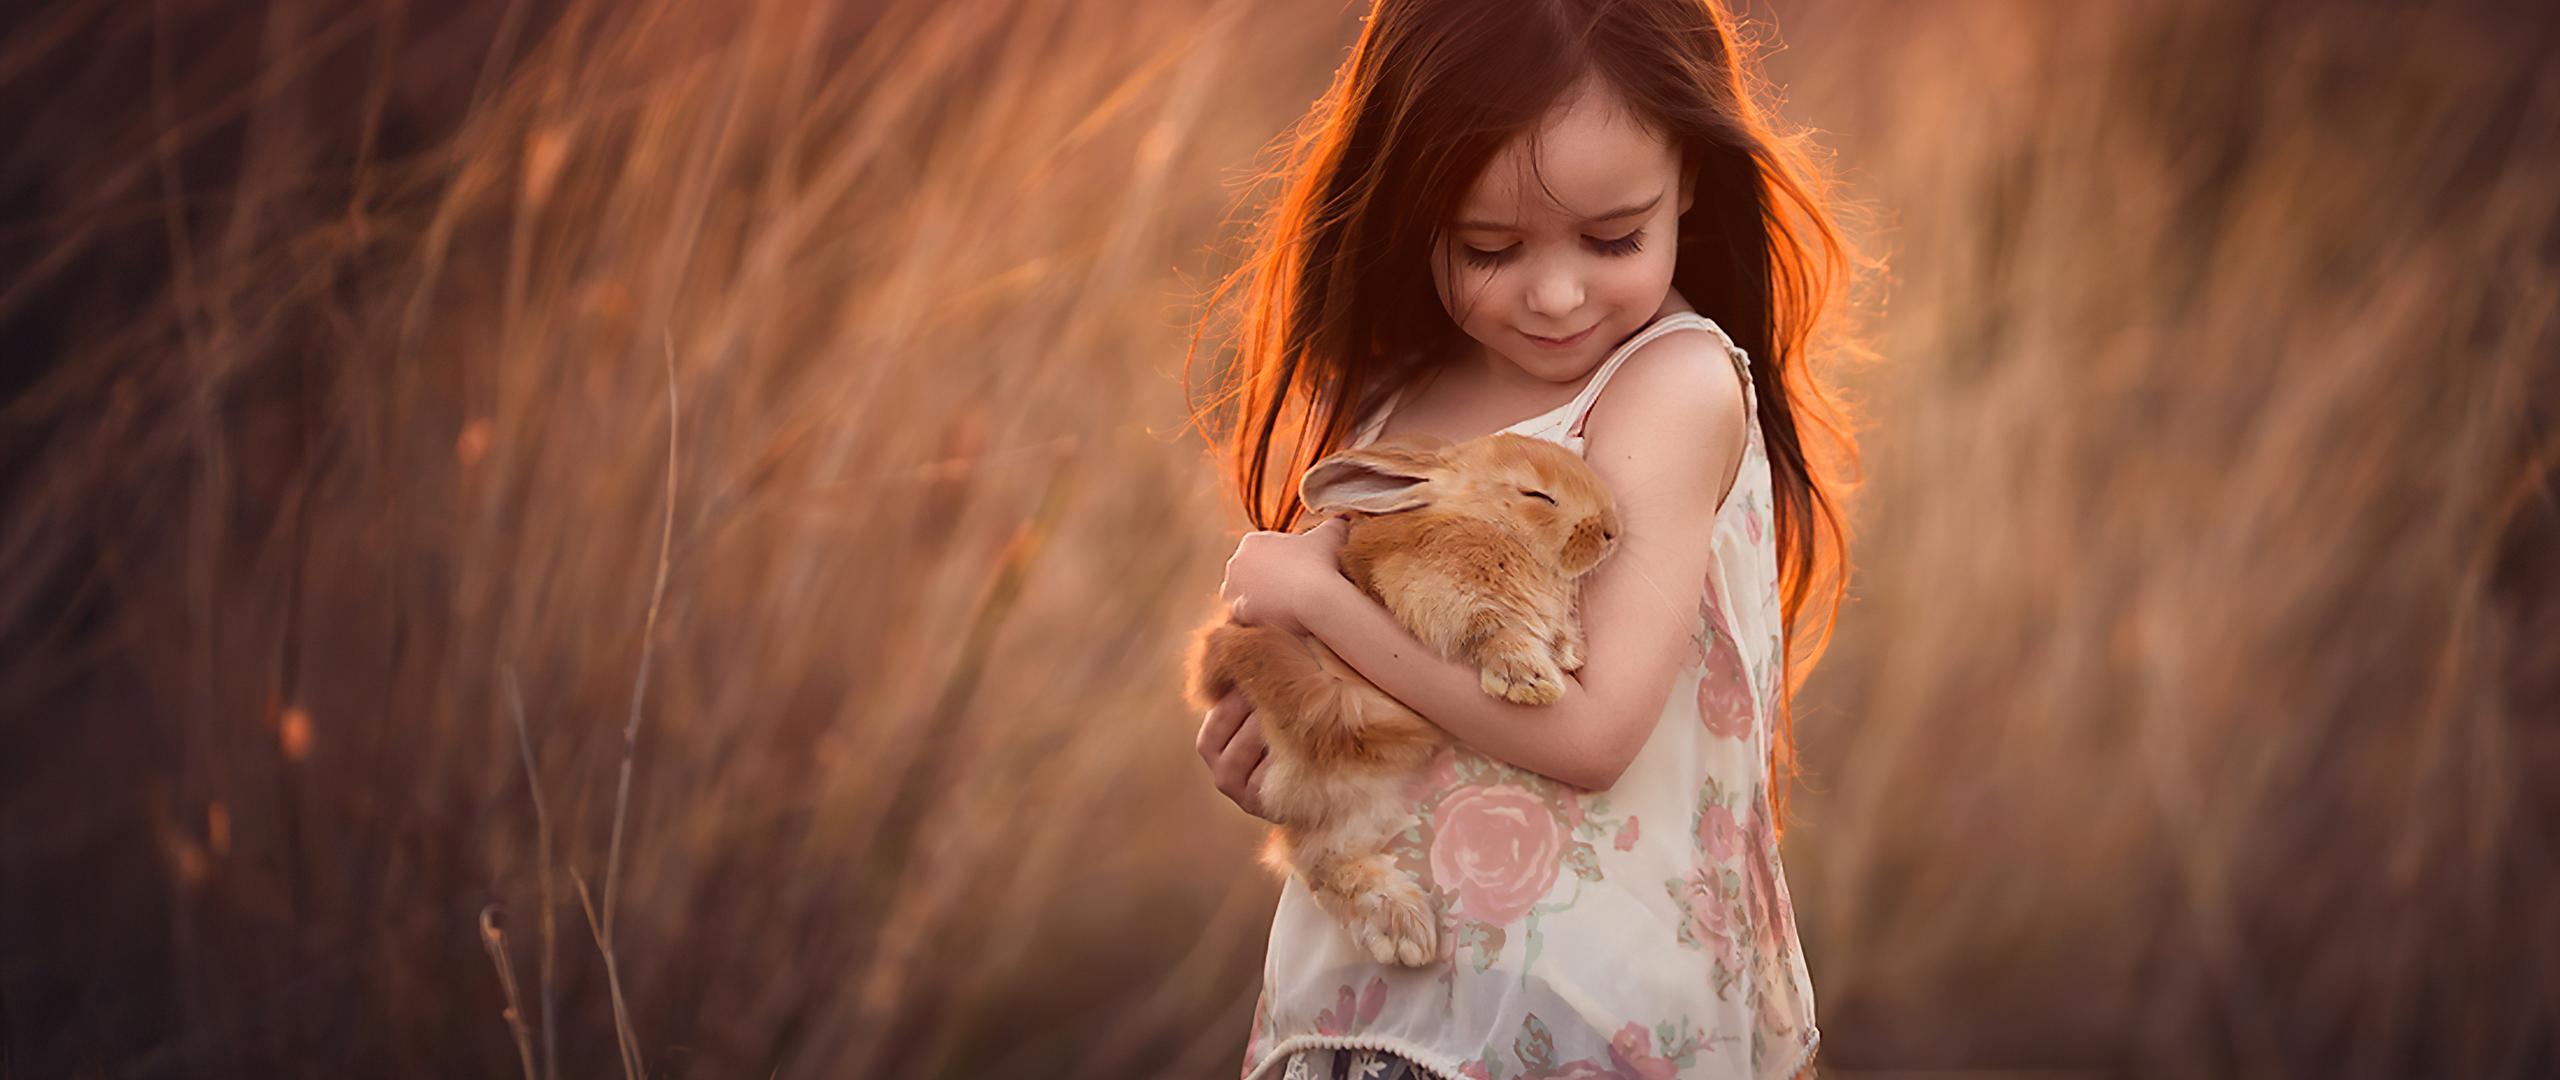 little-girl-with-rabbit-in-hands-4k-12.jpg